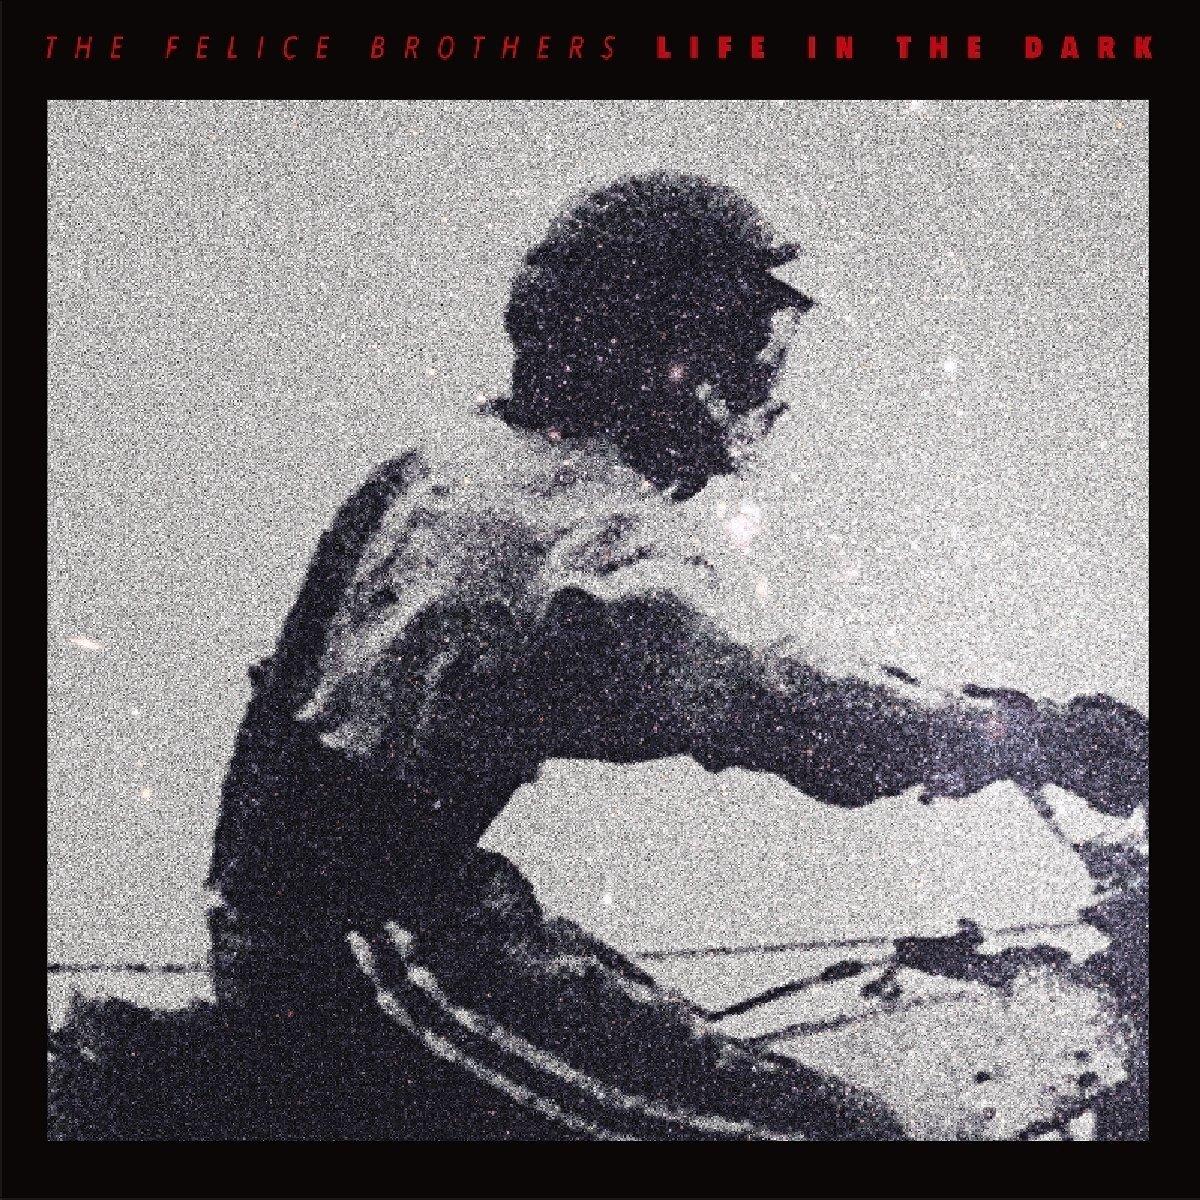 The Felice Brothers – Life In The Dark (Yep Roc)